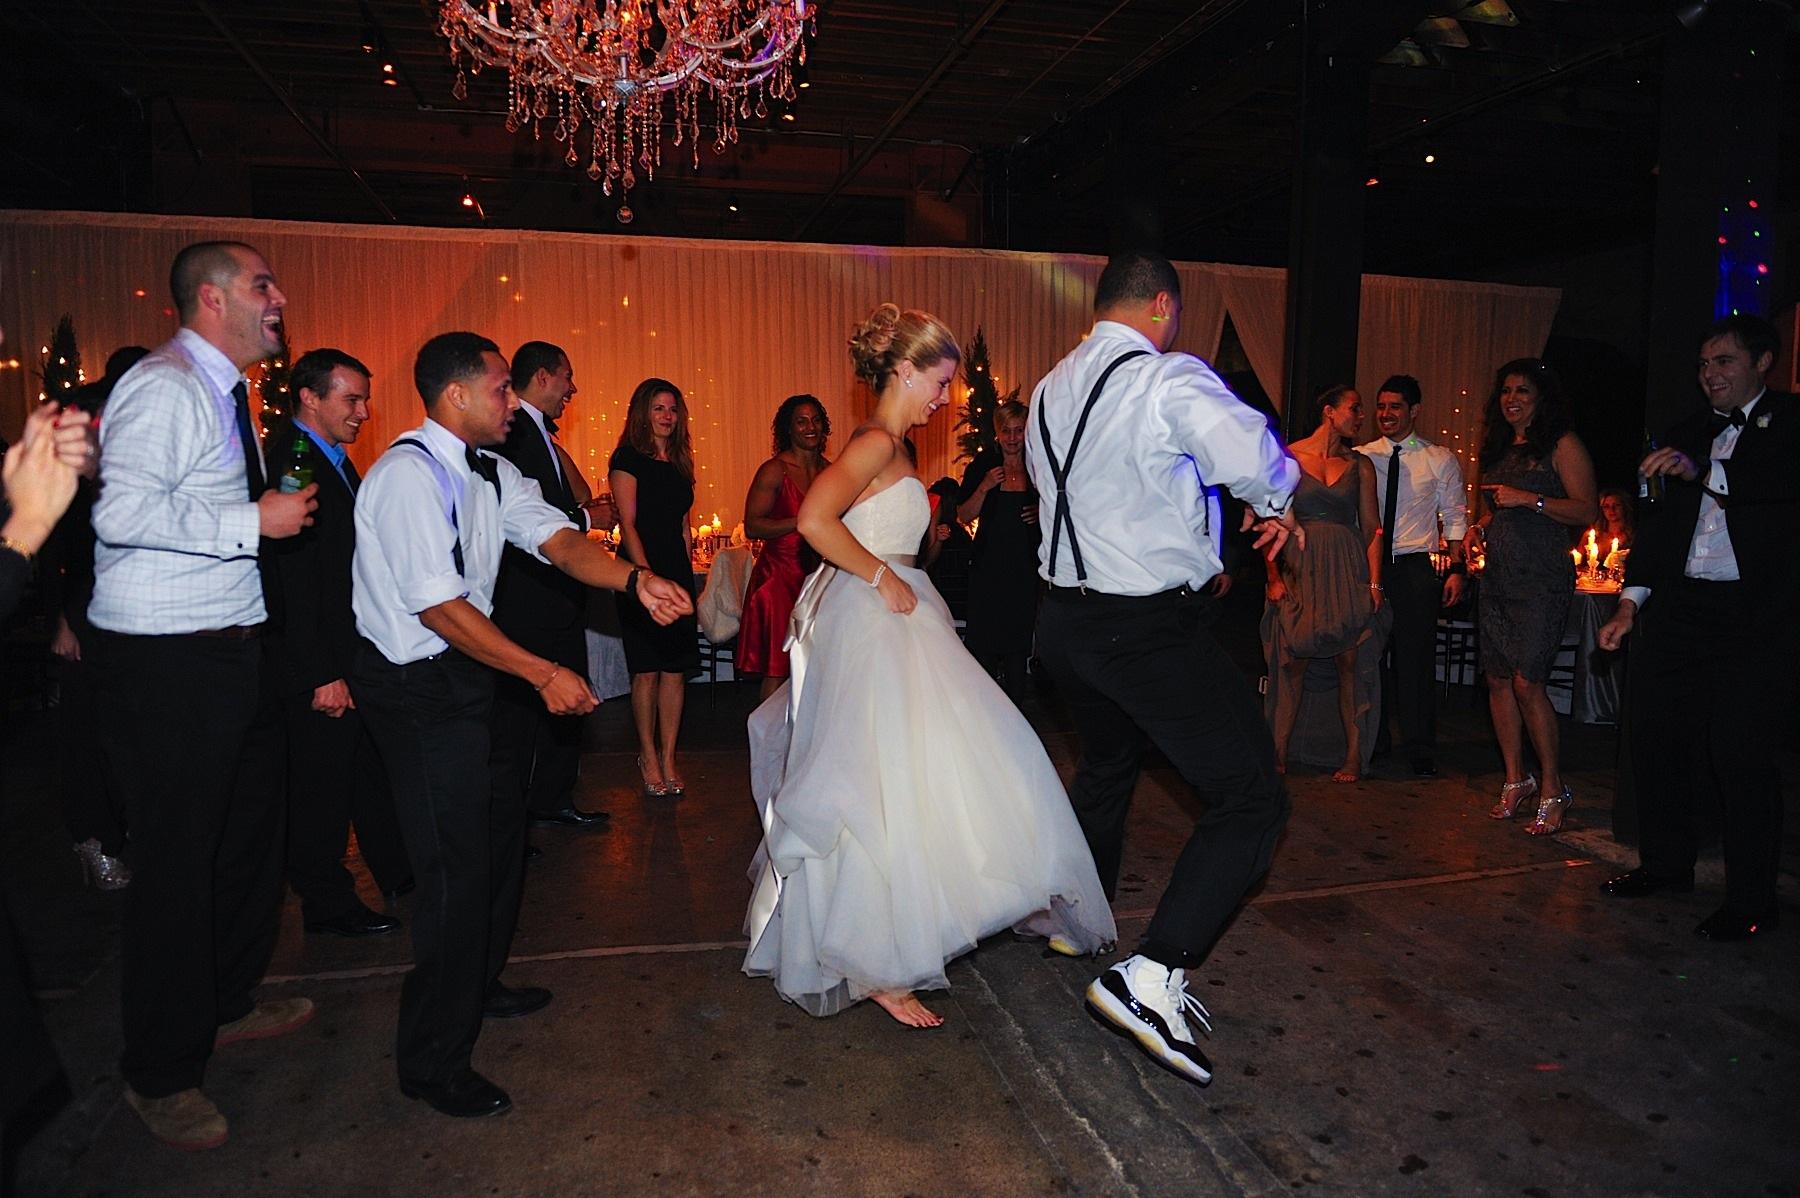 culinary_institute_of_america_napa_valley_wedding_123photographer_